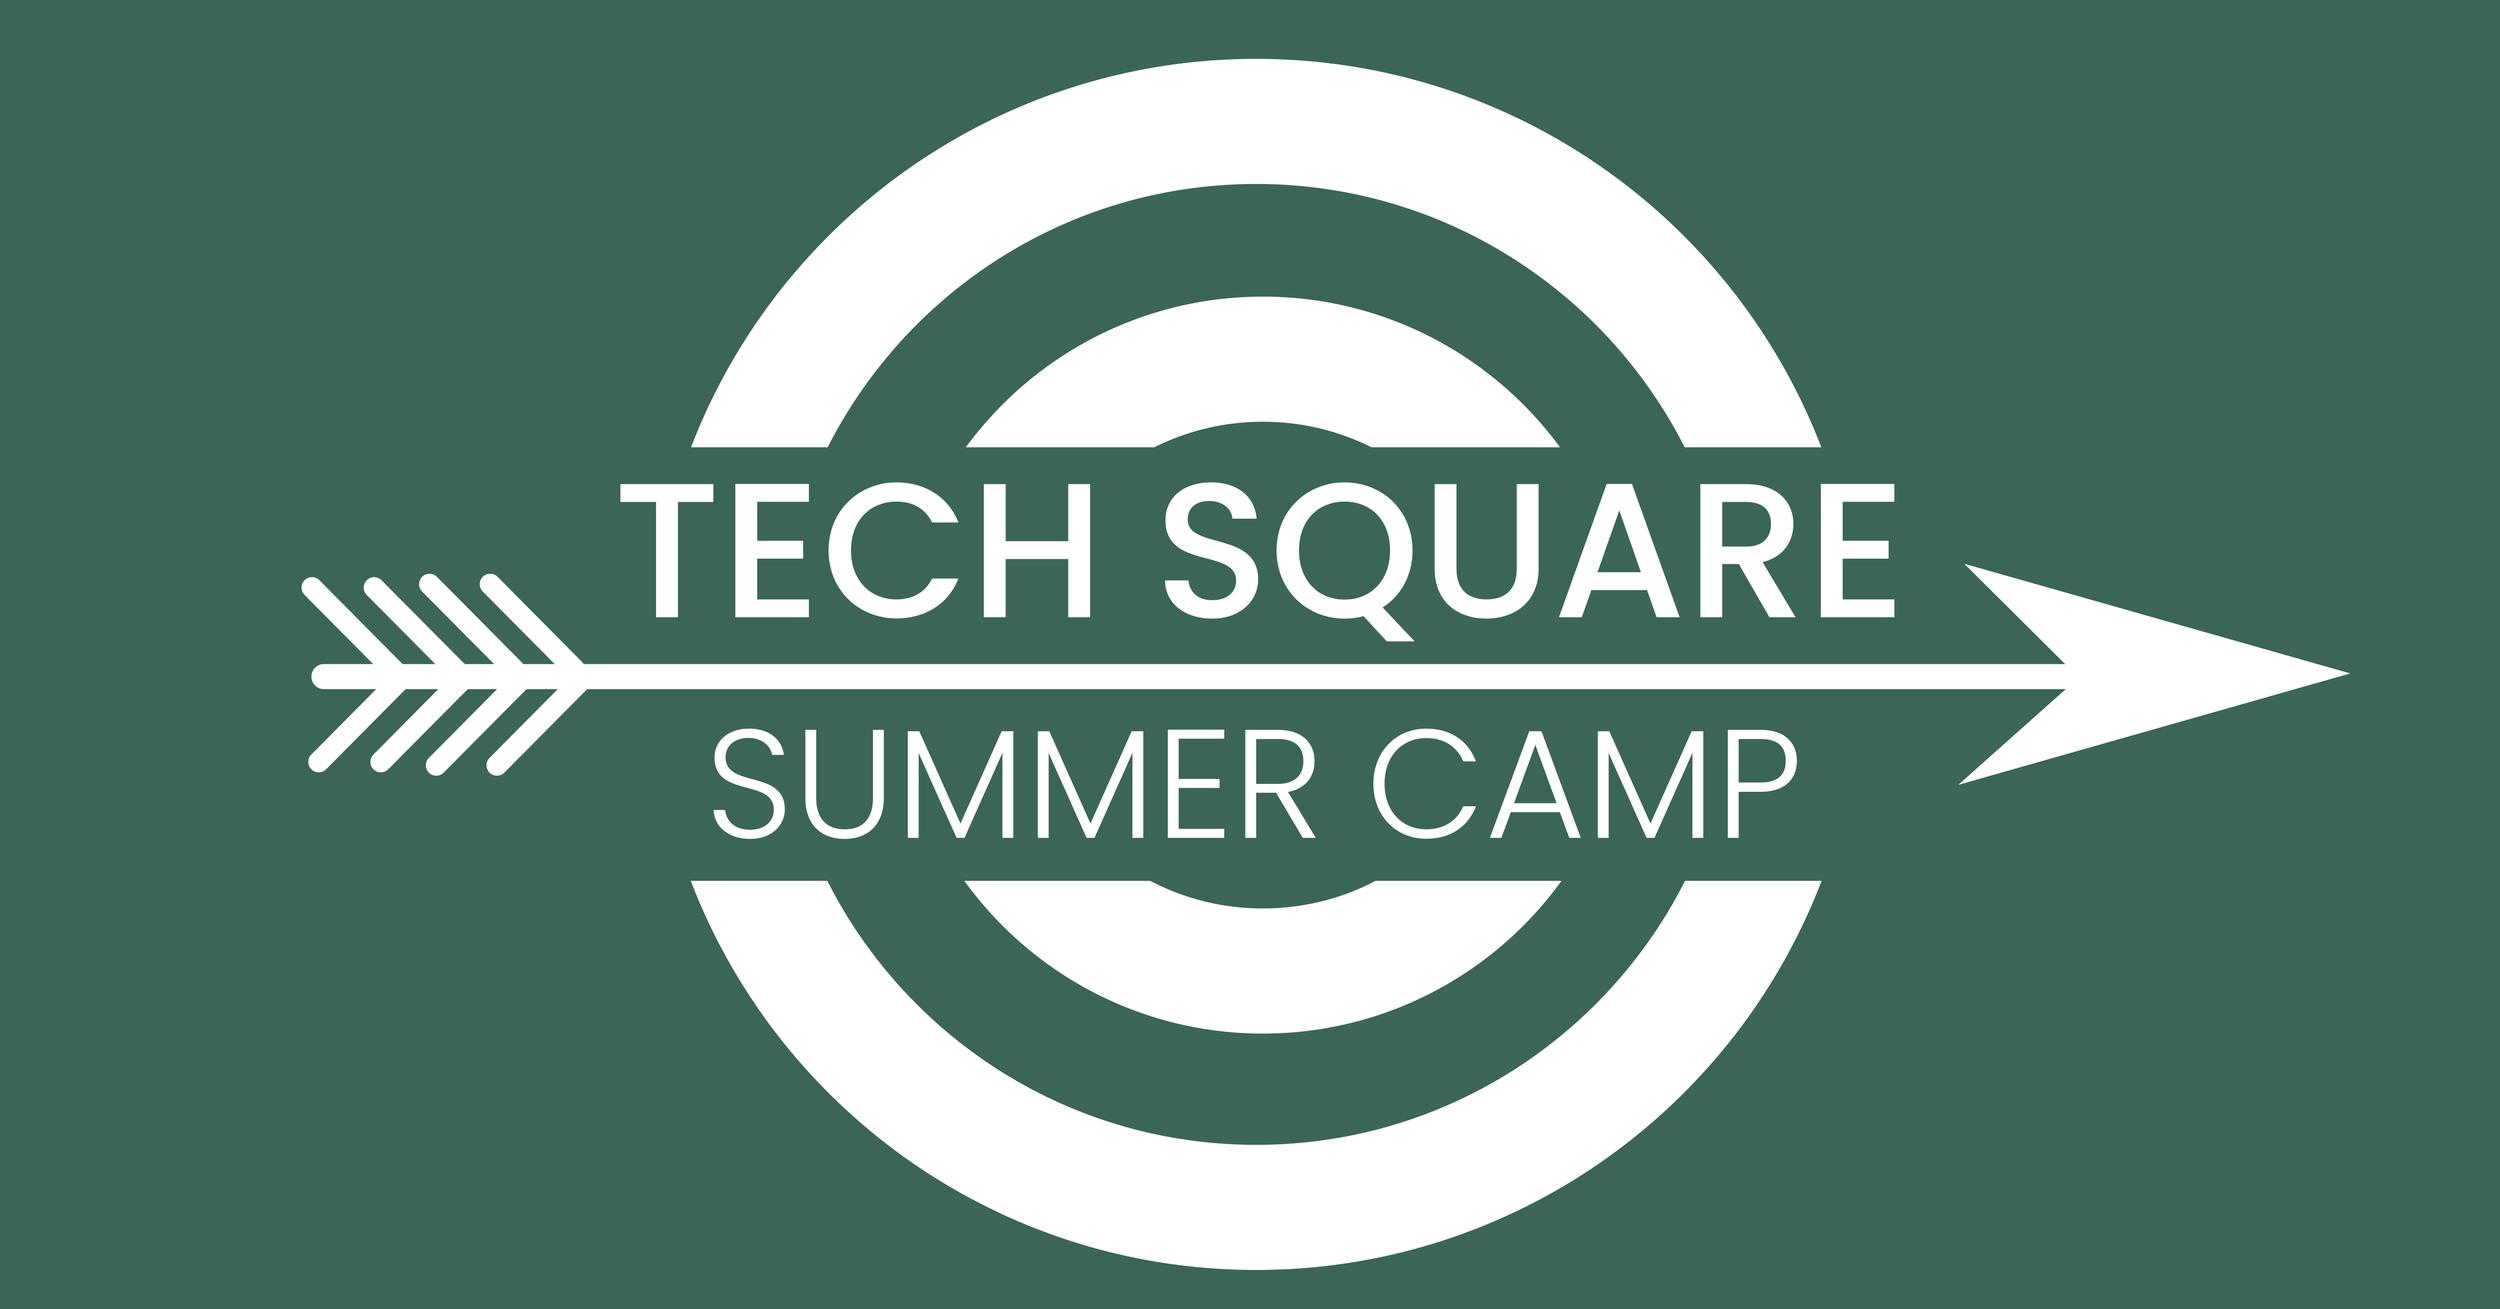 fb-summer-camp-header.png